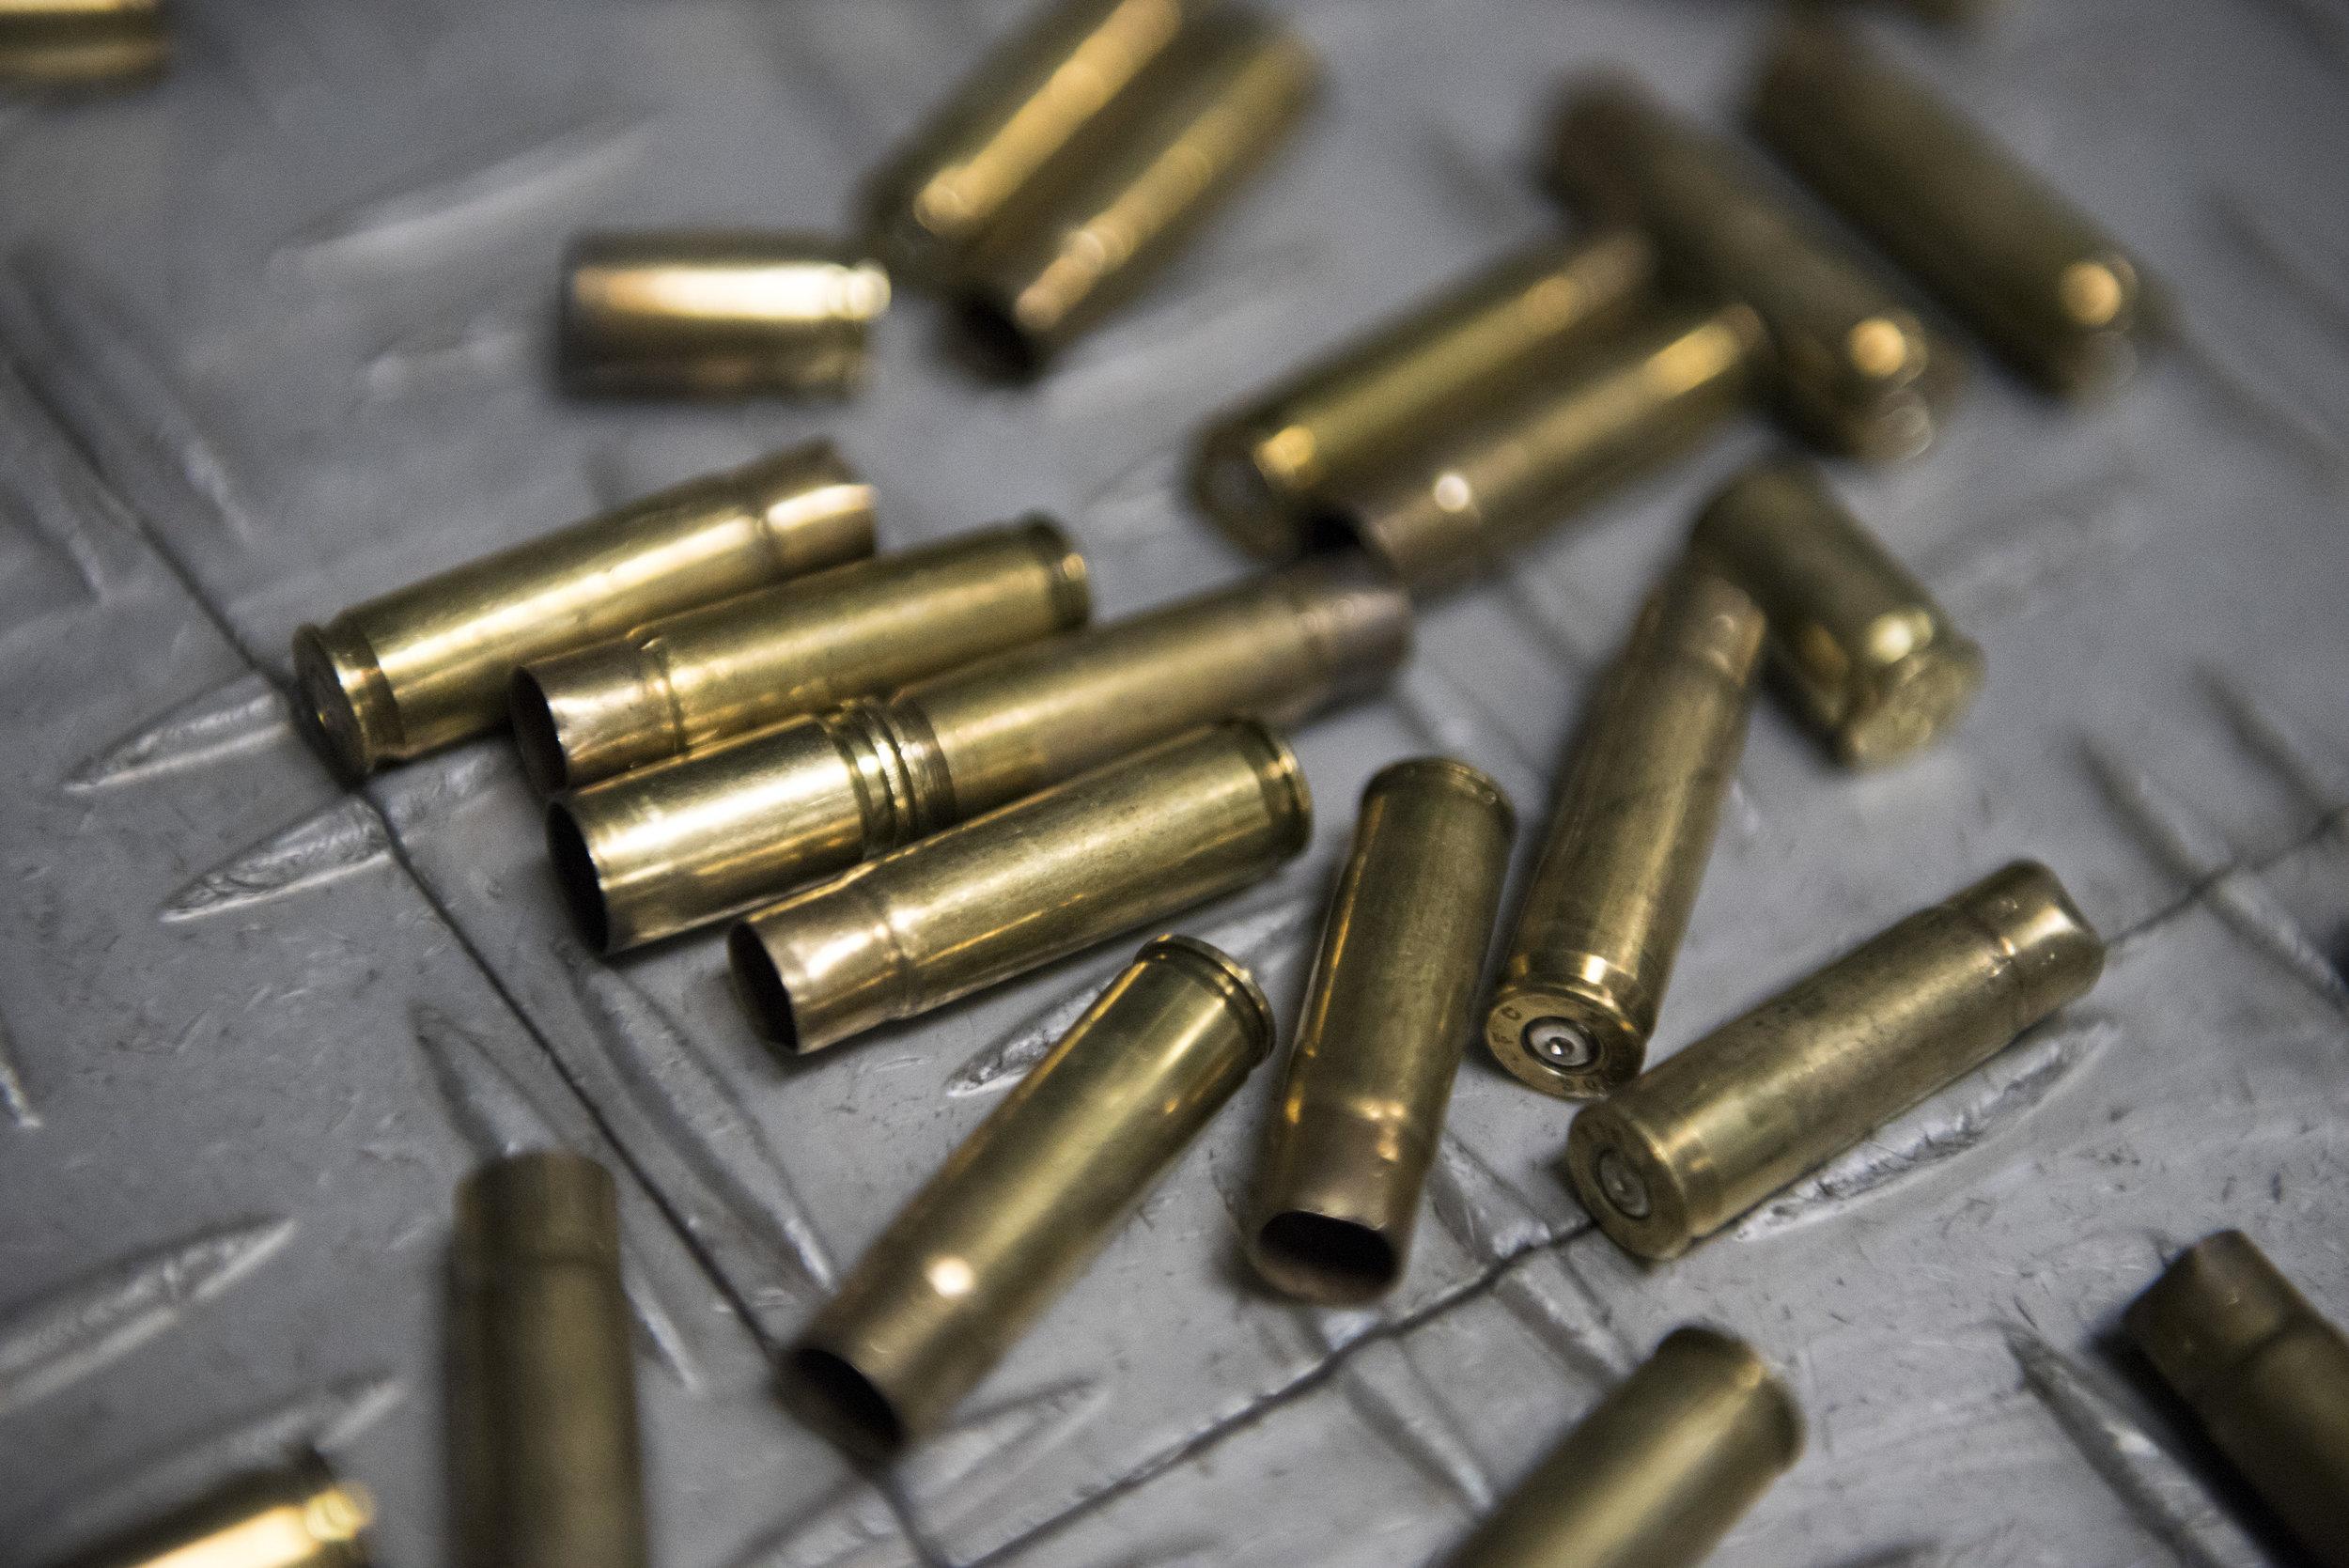 Bullet casings are scattered across the floor at Green Valley Range in Henderson, Nev..